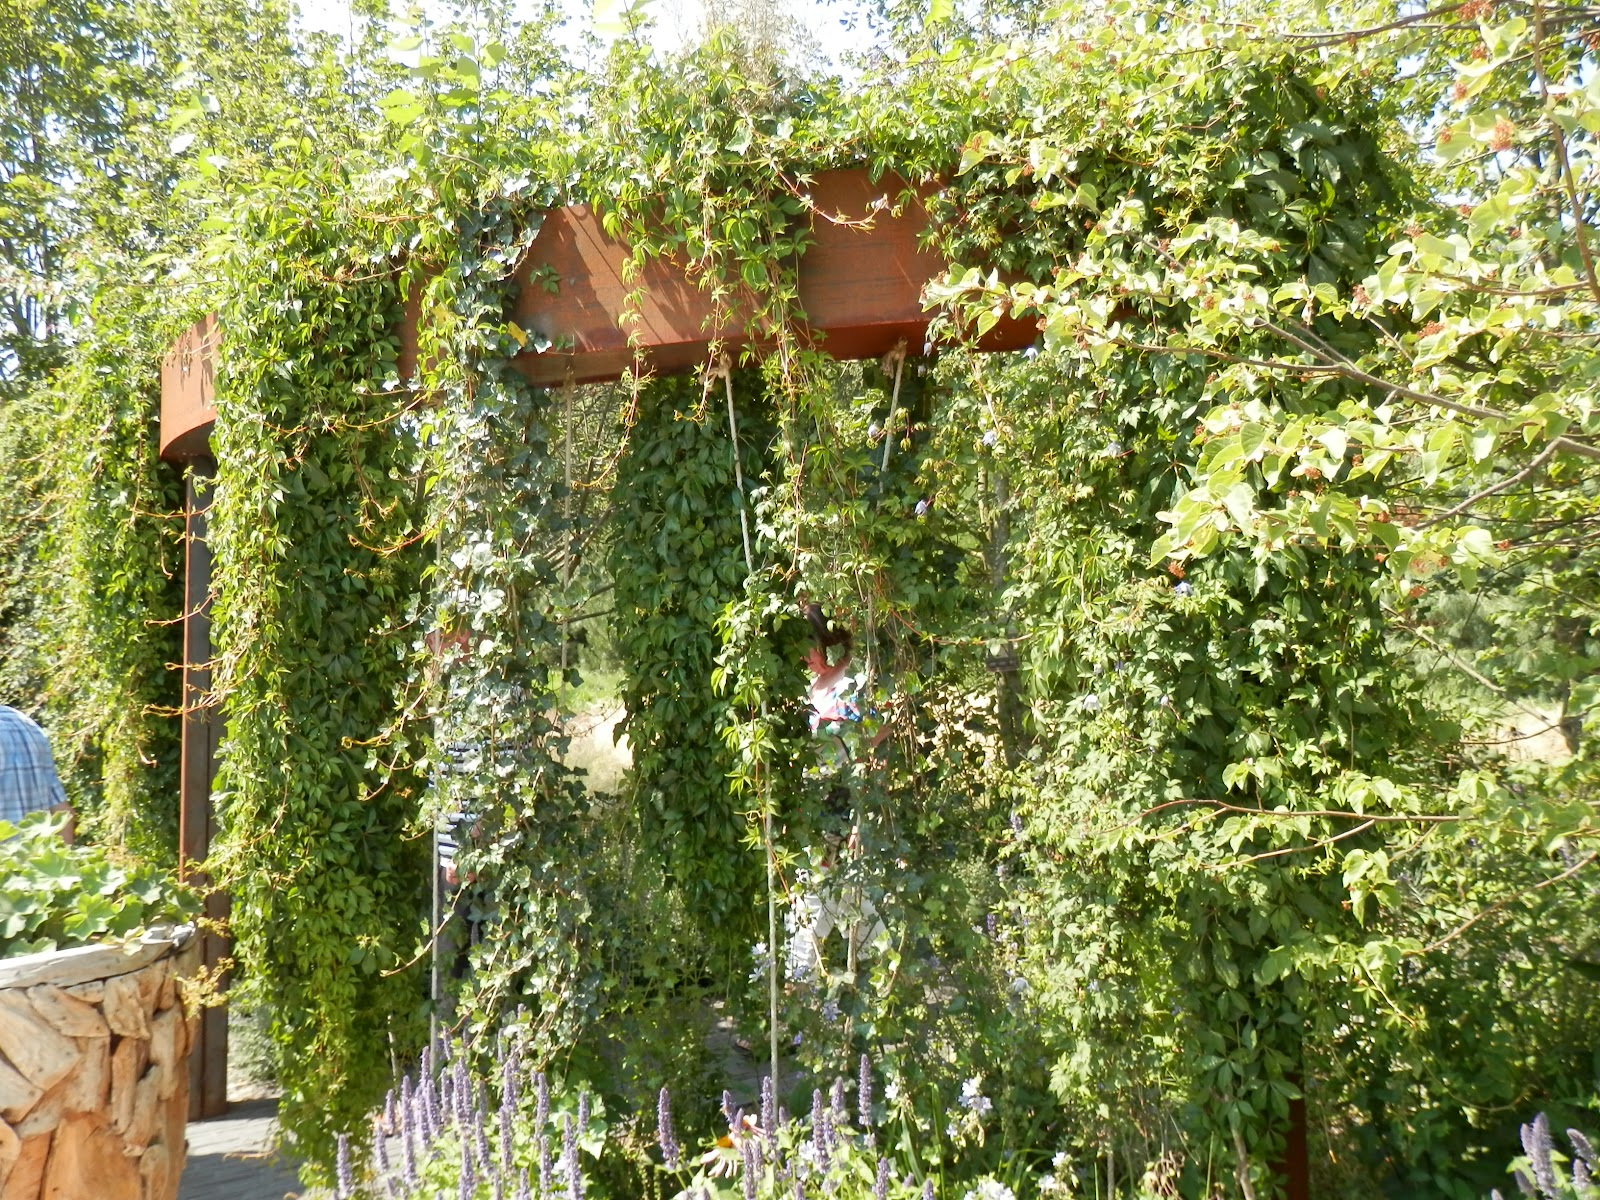 Groene Afscheiding Tuin : Tuinweetjes pergola begroeide boog in tuinen